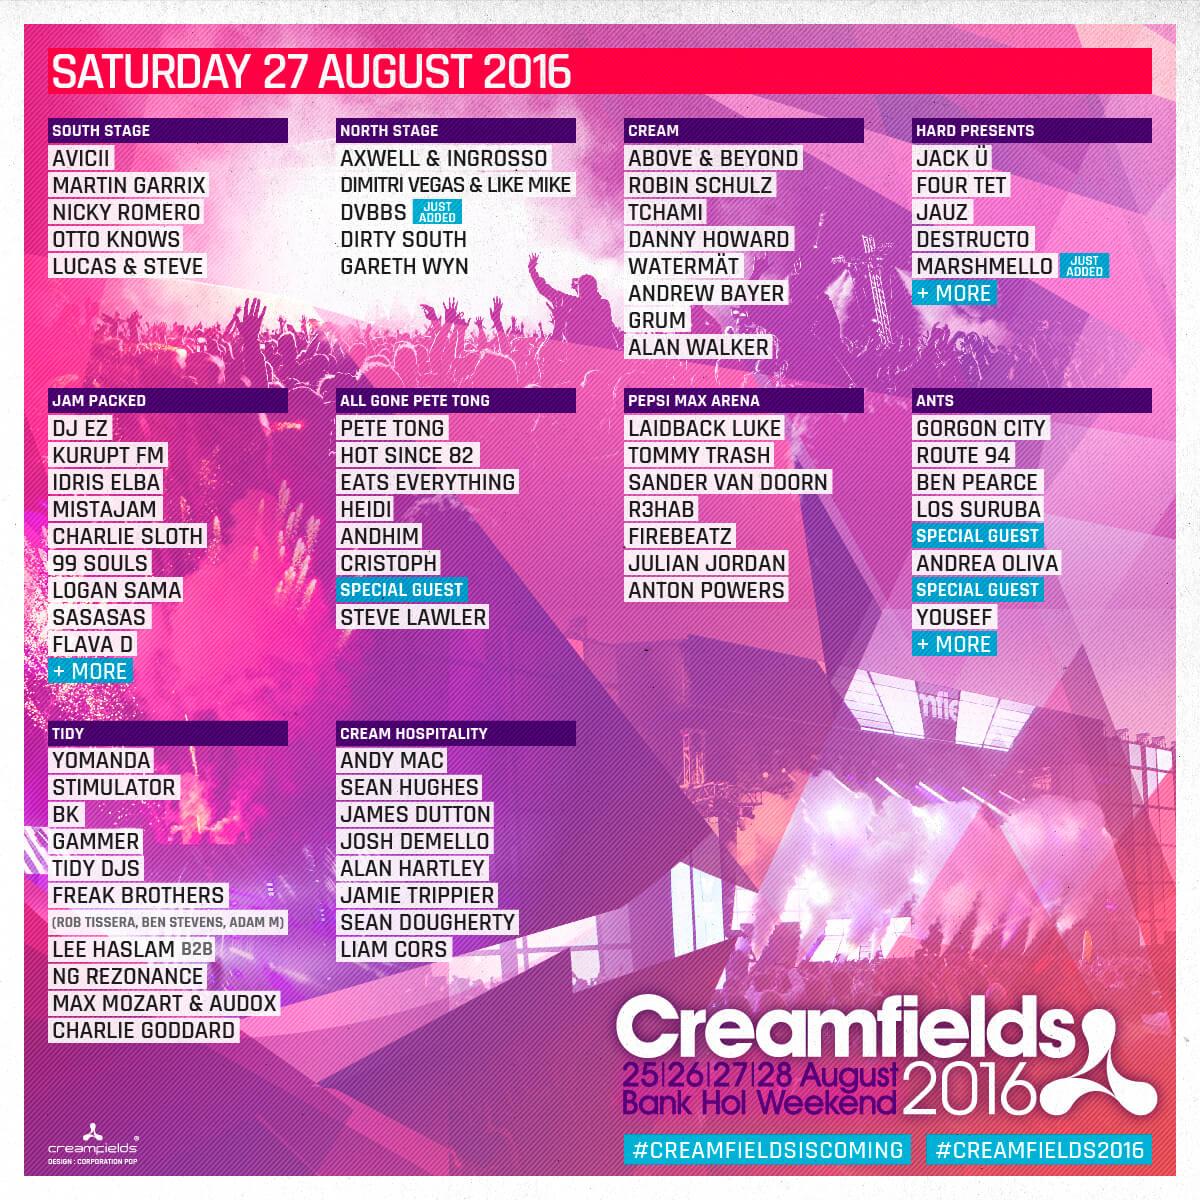 Cream Fields 2016: The Full Line up - Flick Of The Finger